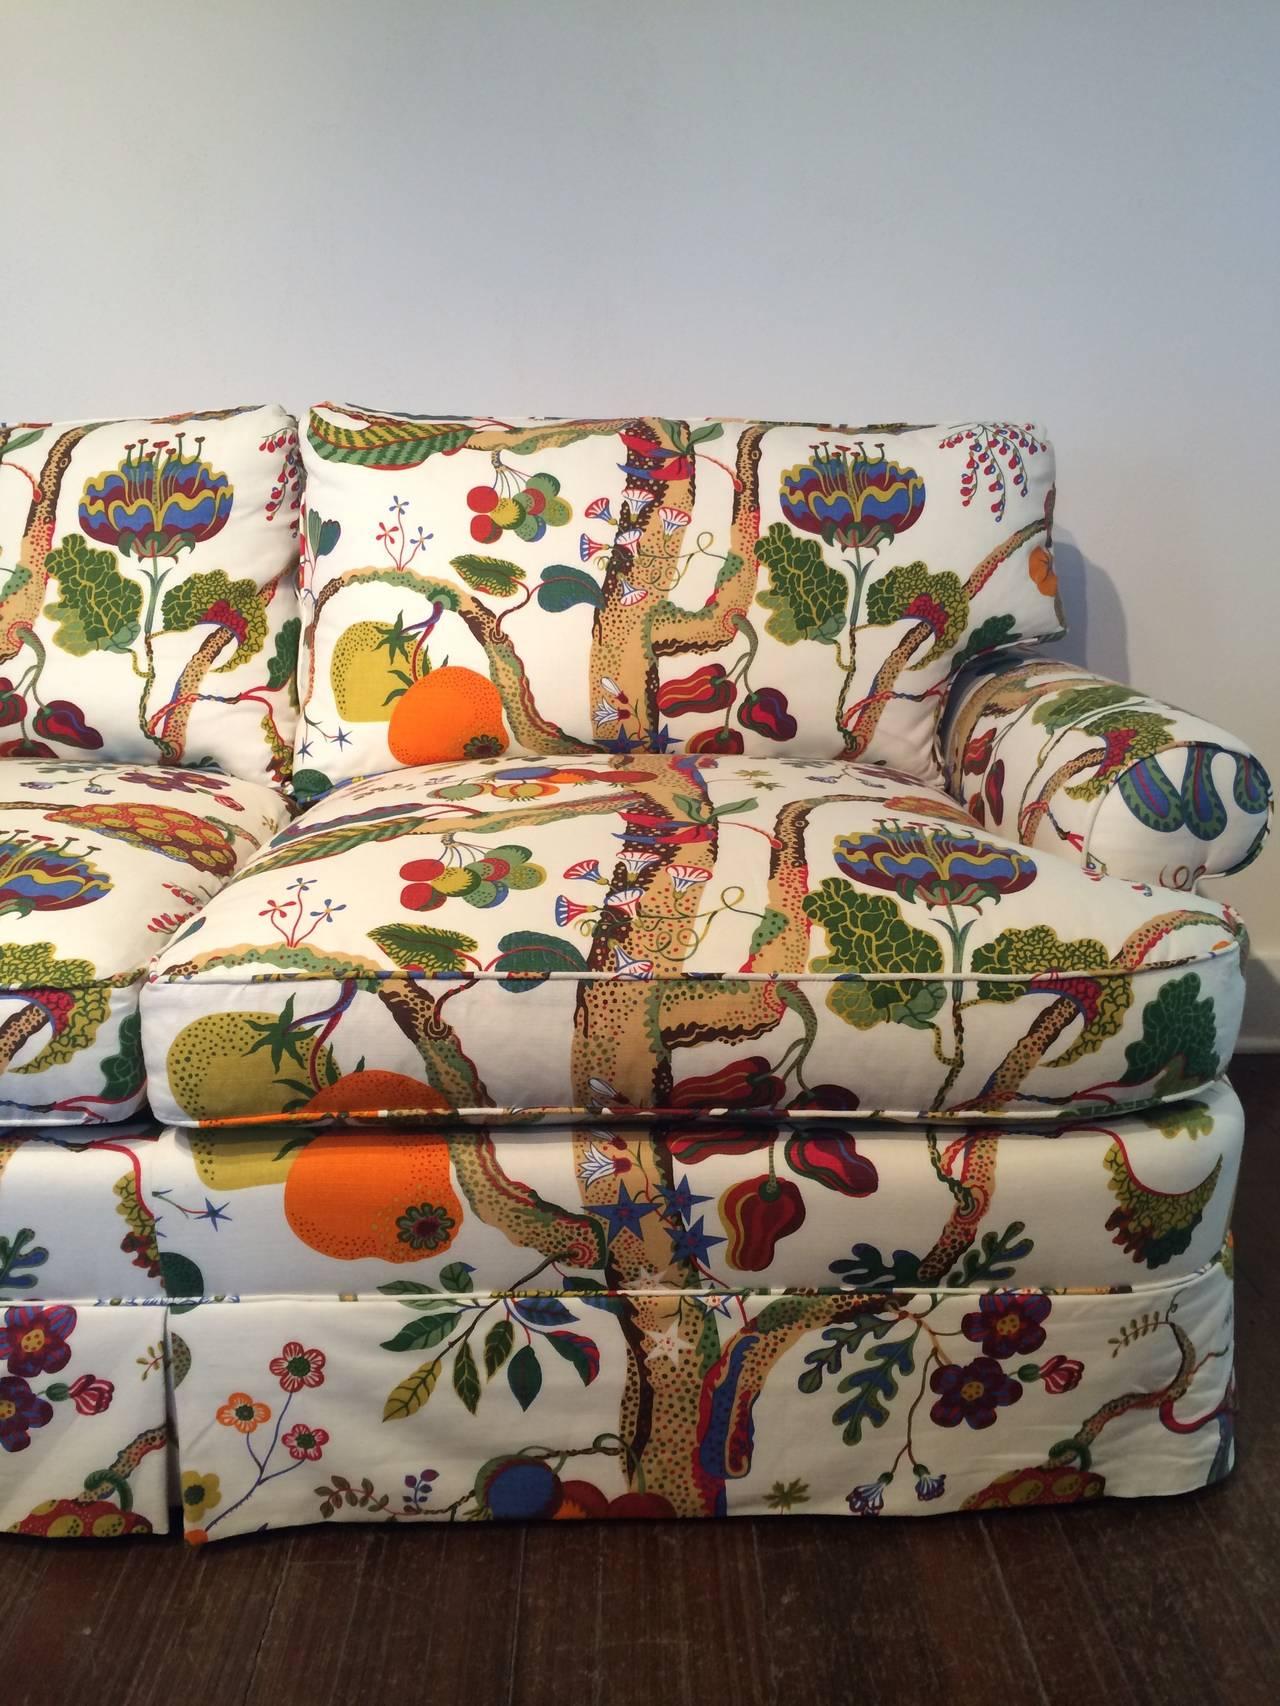 Custom Loveseat Upholstered In Josef Frank Fabric At 1stdibs